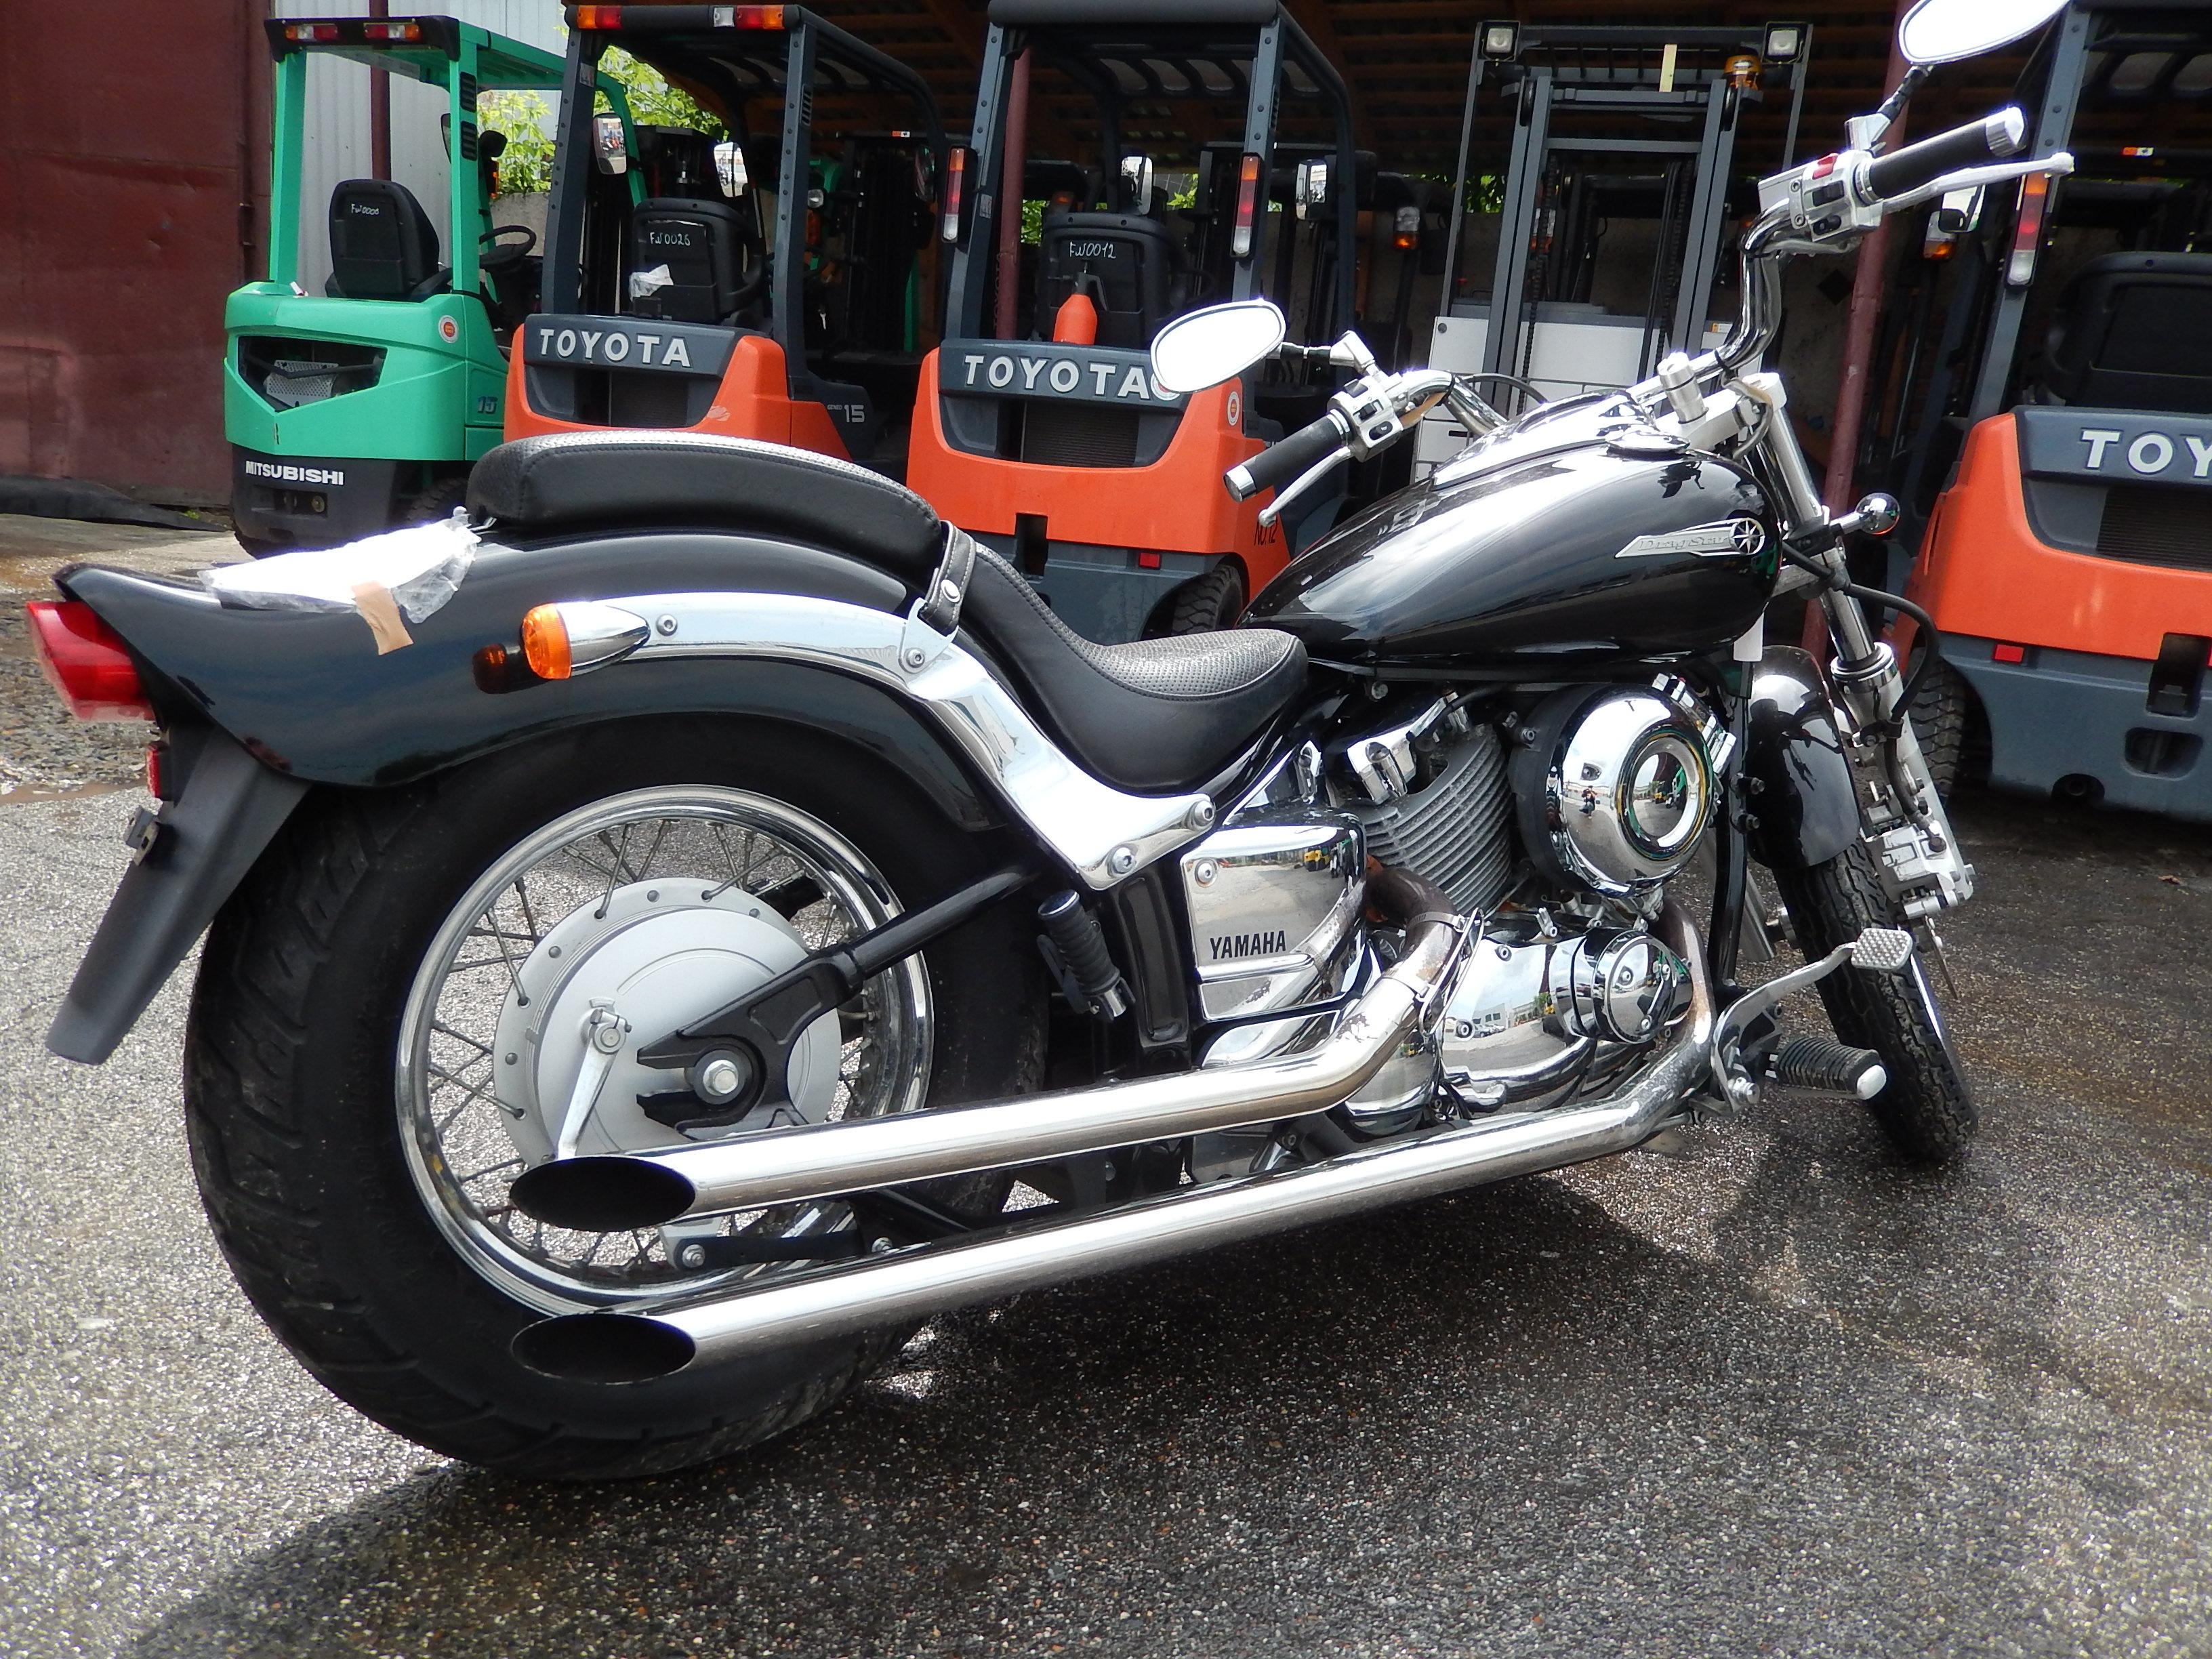 Тест-драйв мотоцикла Yamaha XVS400 Drag Star